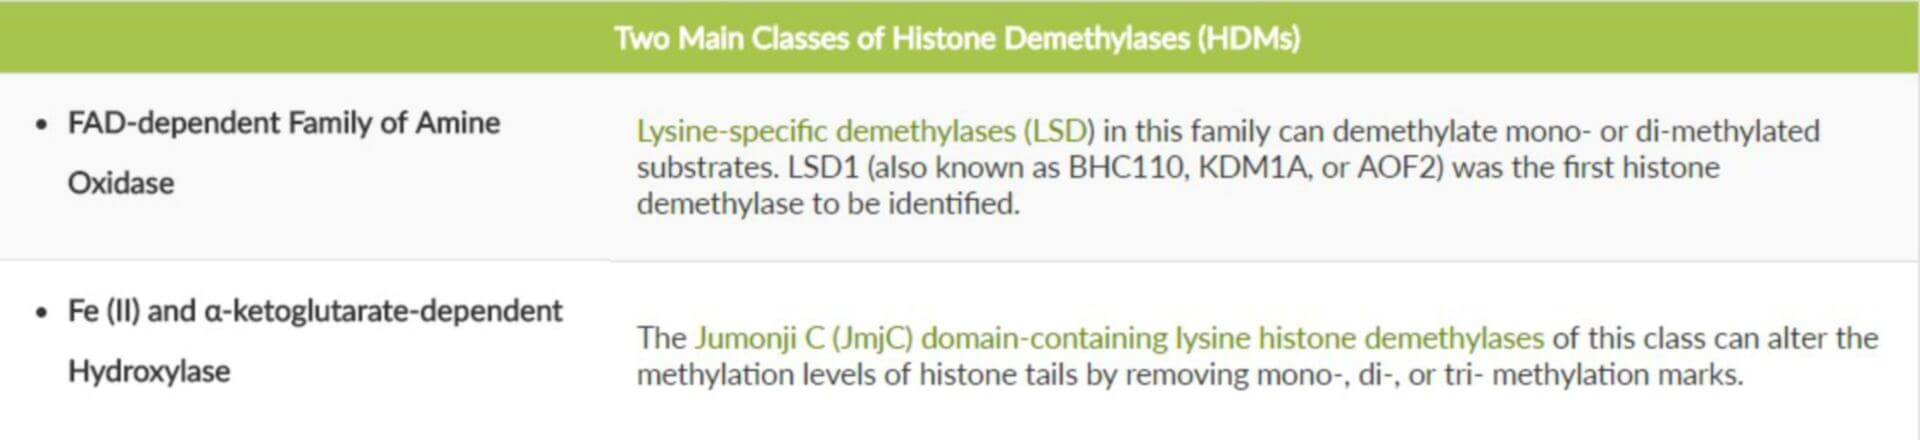 histone demethylase inhibitor